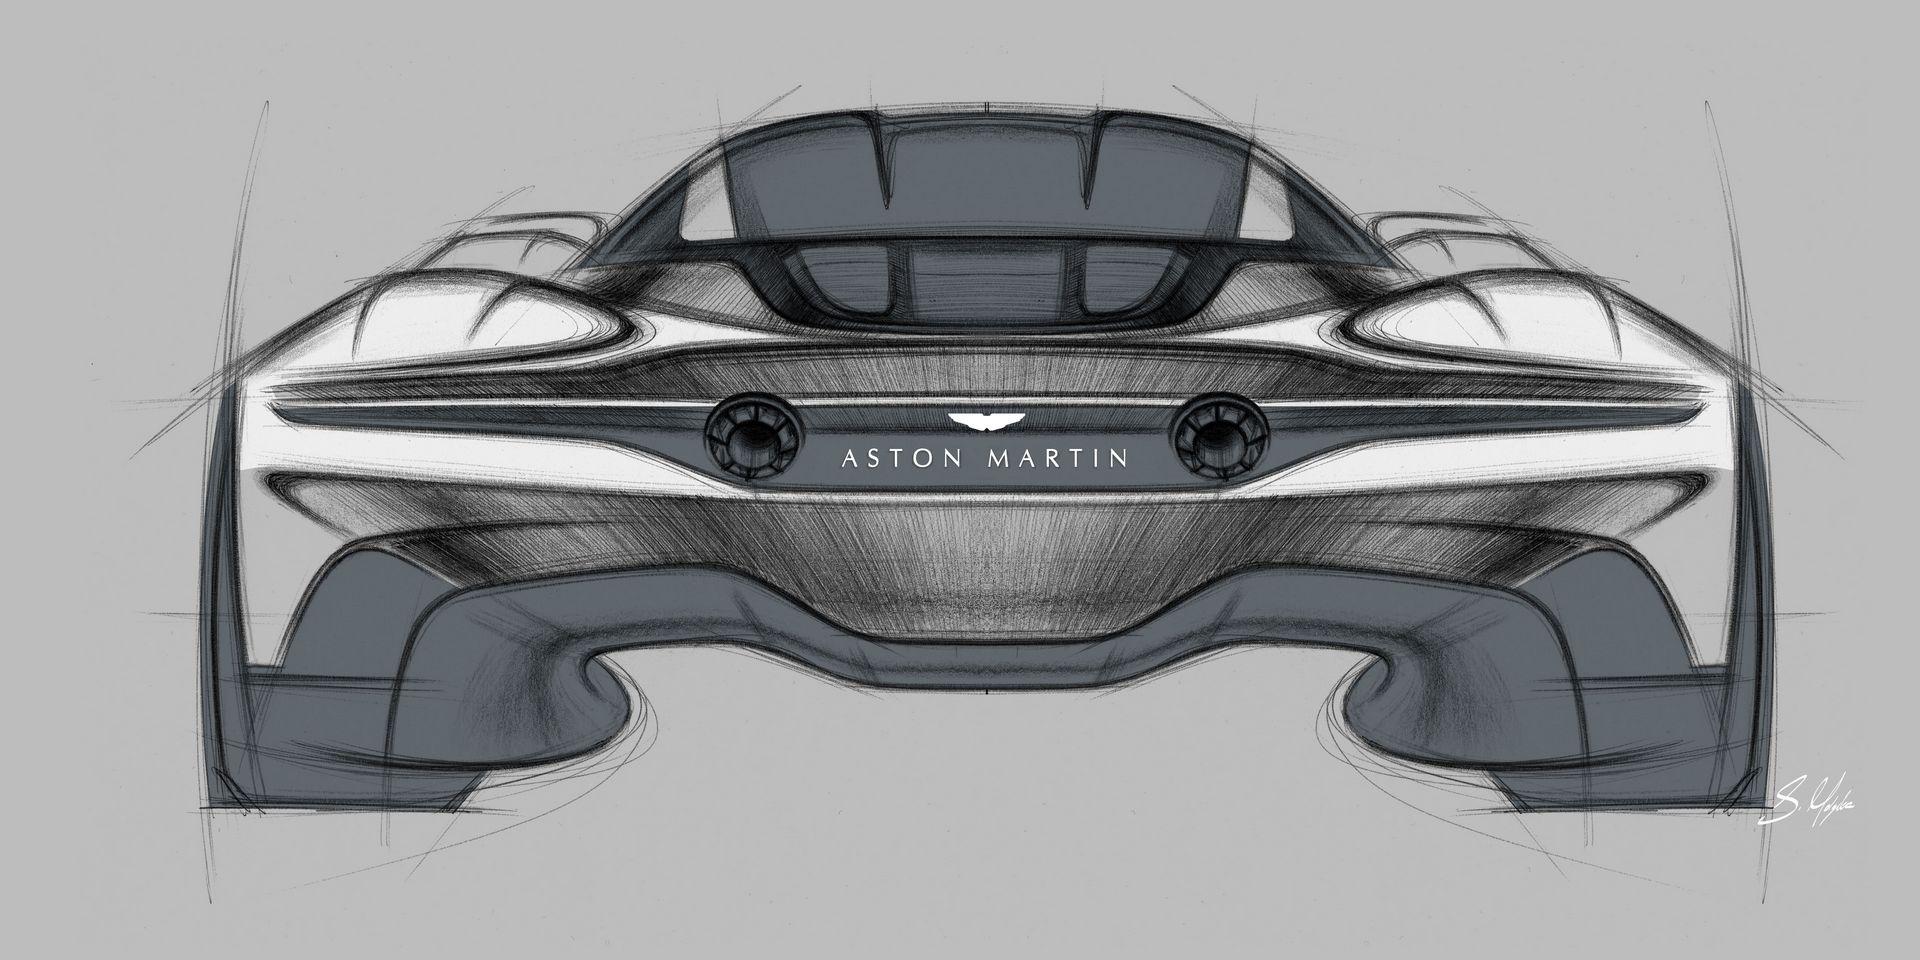 Aston Martin Vanquish Vision Concept (11)